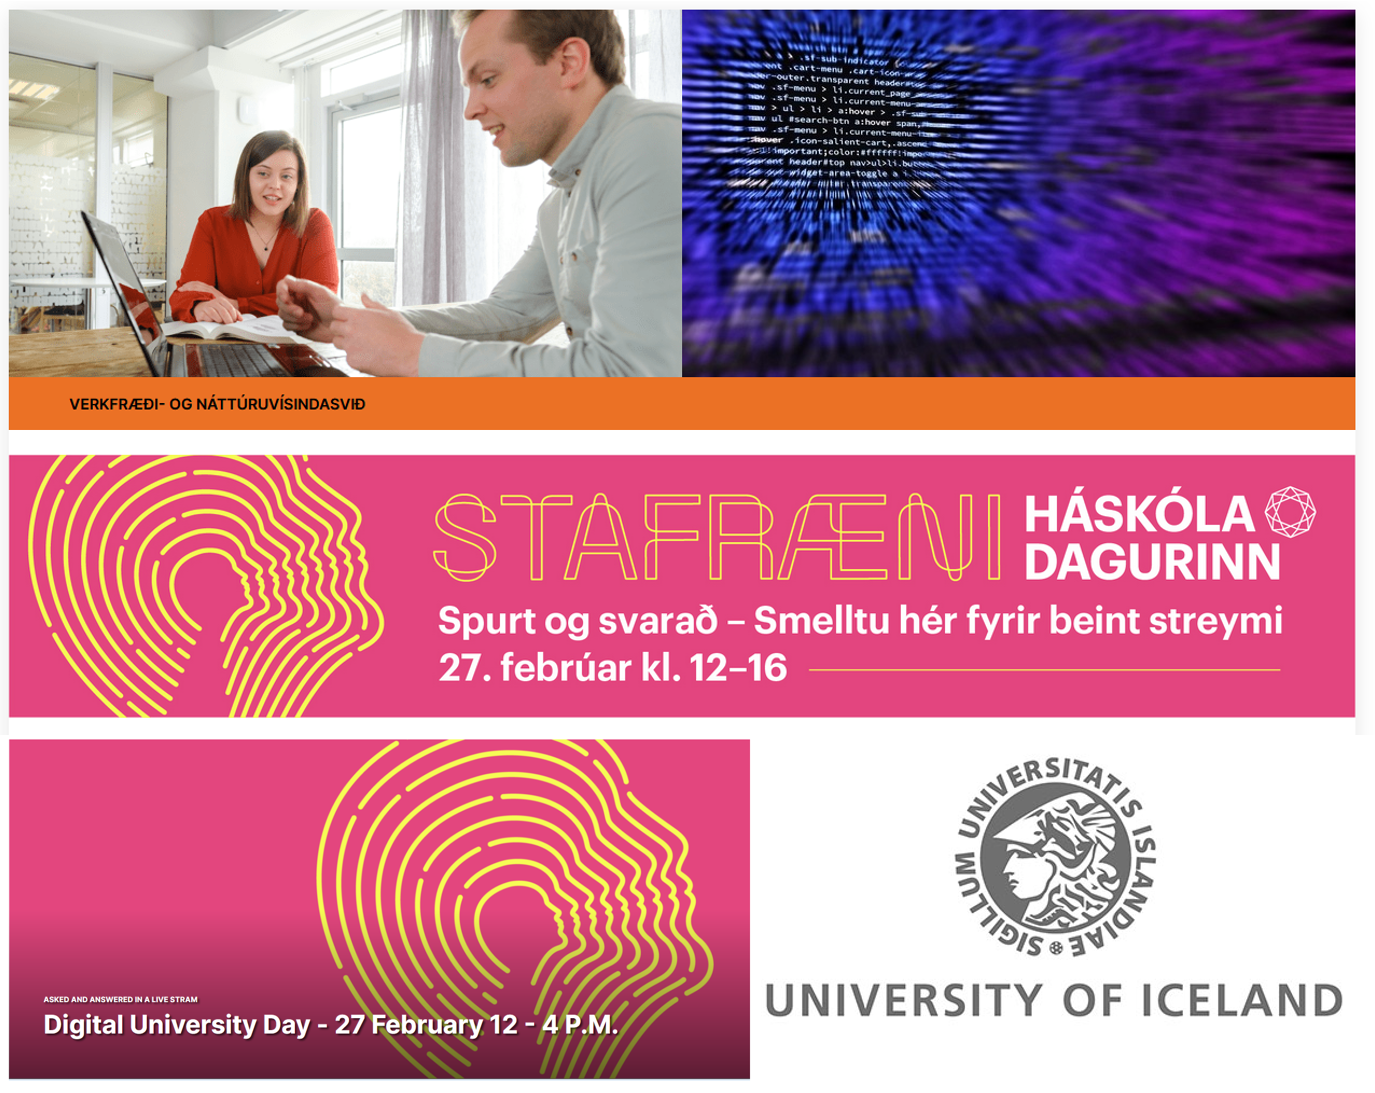 Morris Riedel 2021 Digital University Day Haskoladagurinn University of Iceland